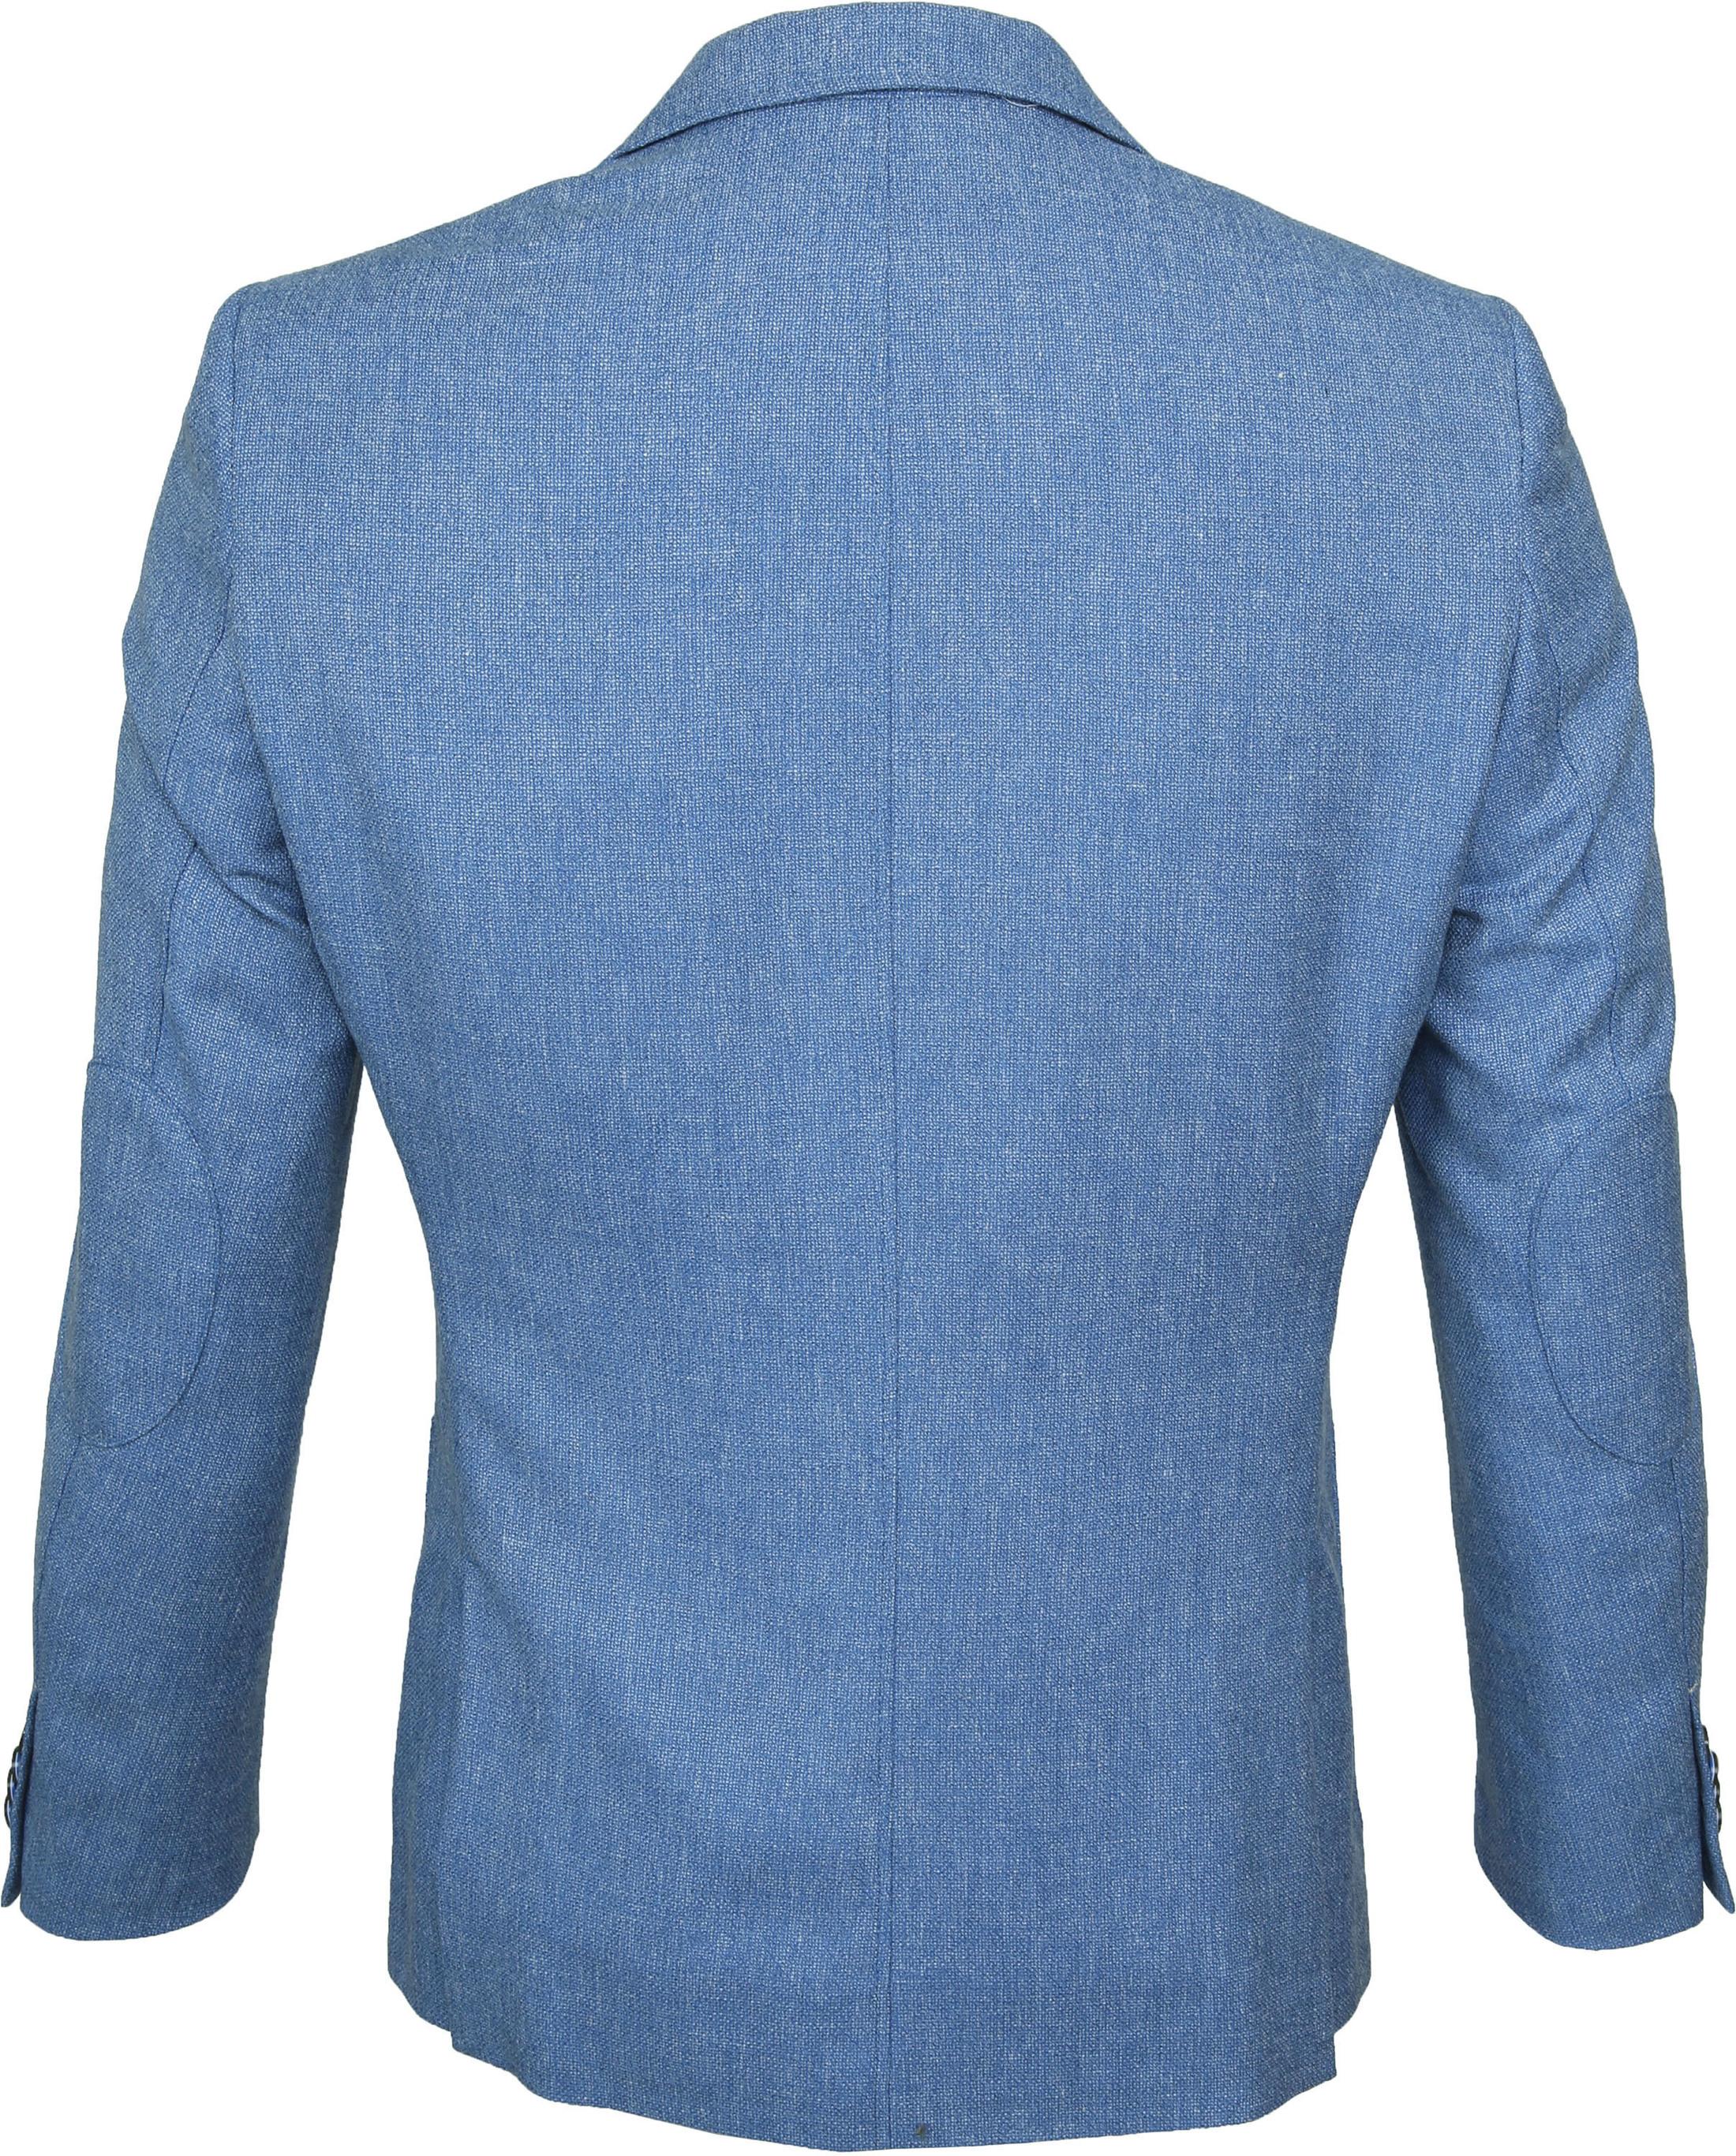 Suitable Blazer Tolo Lichtblauw foto 2